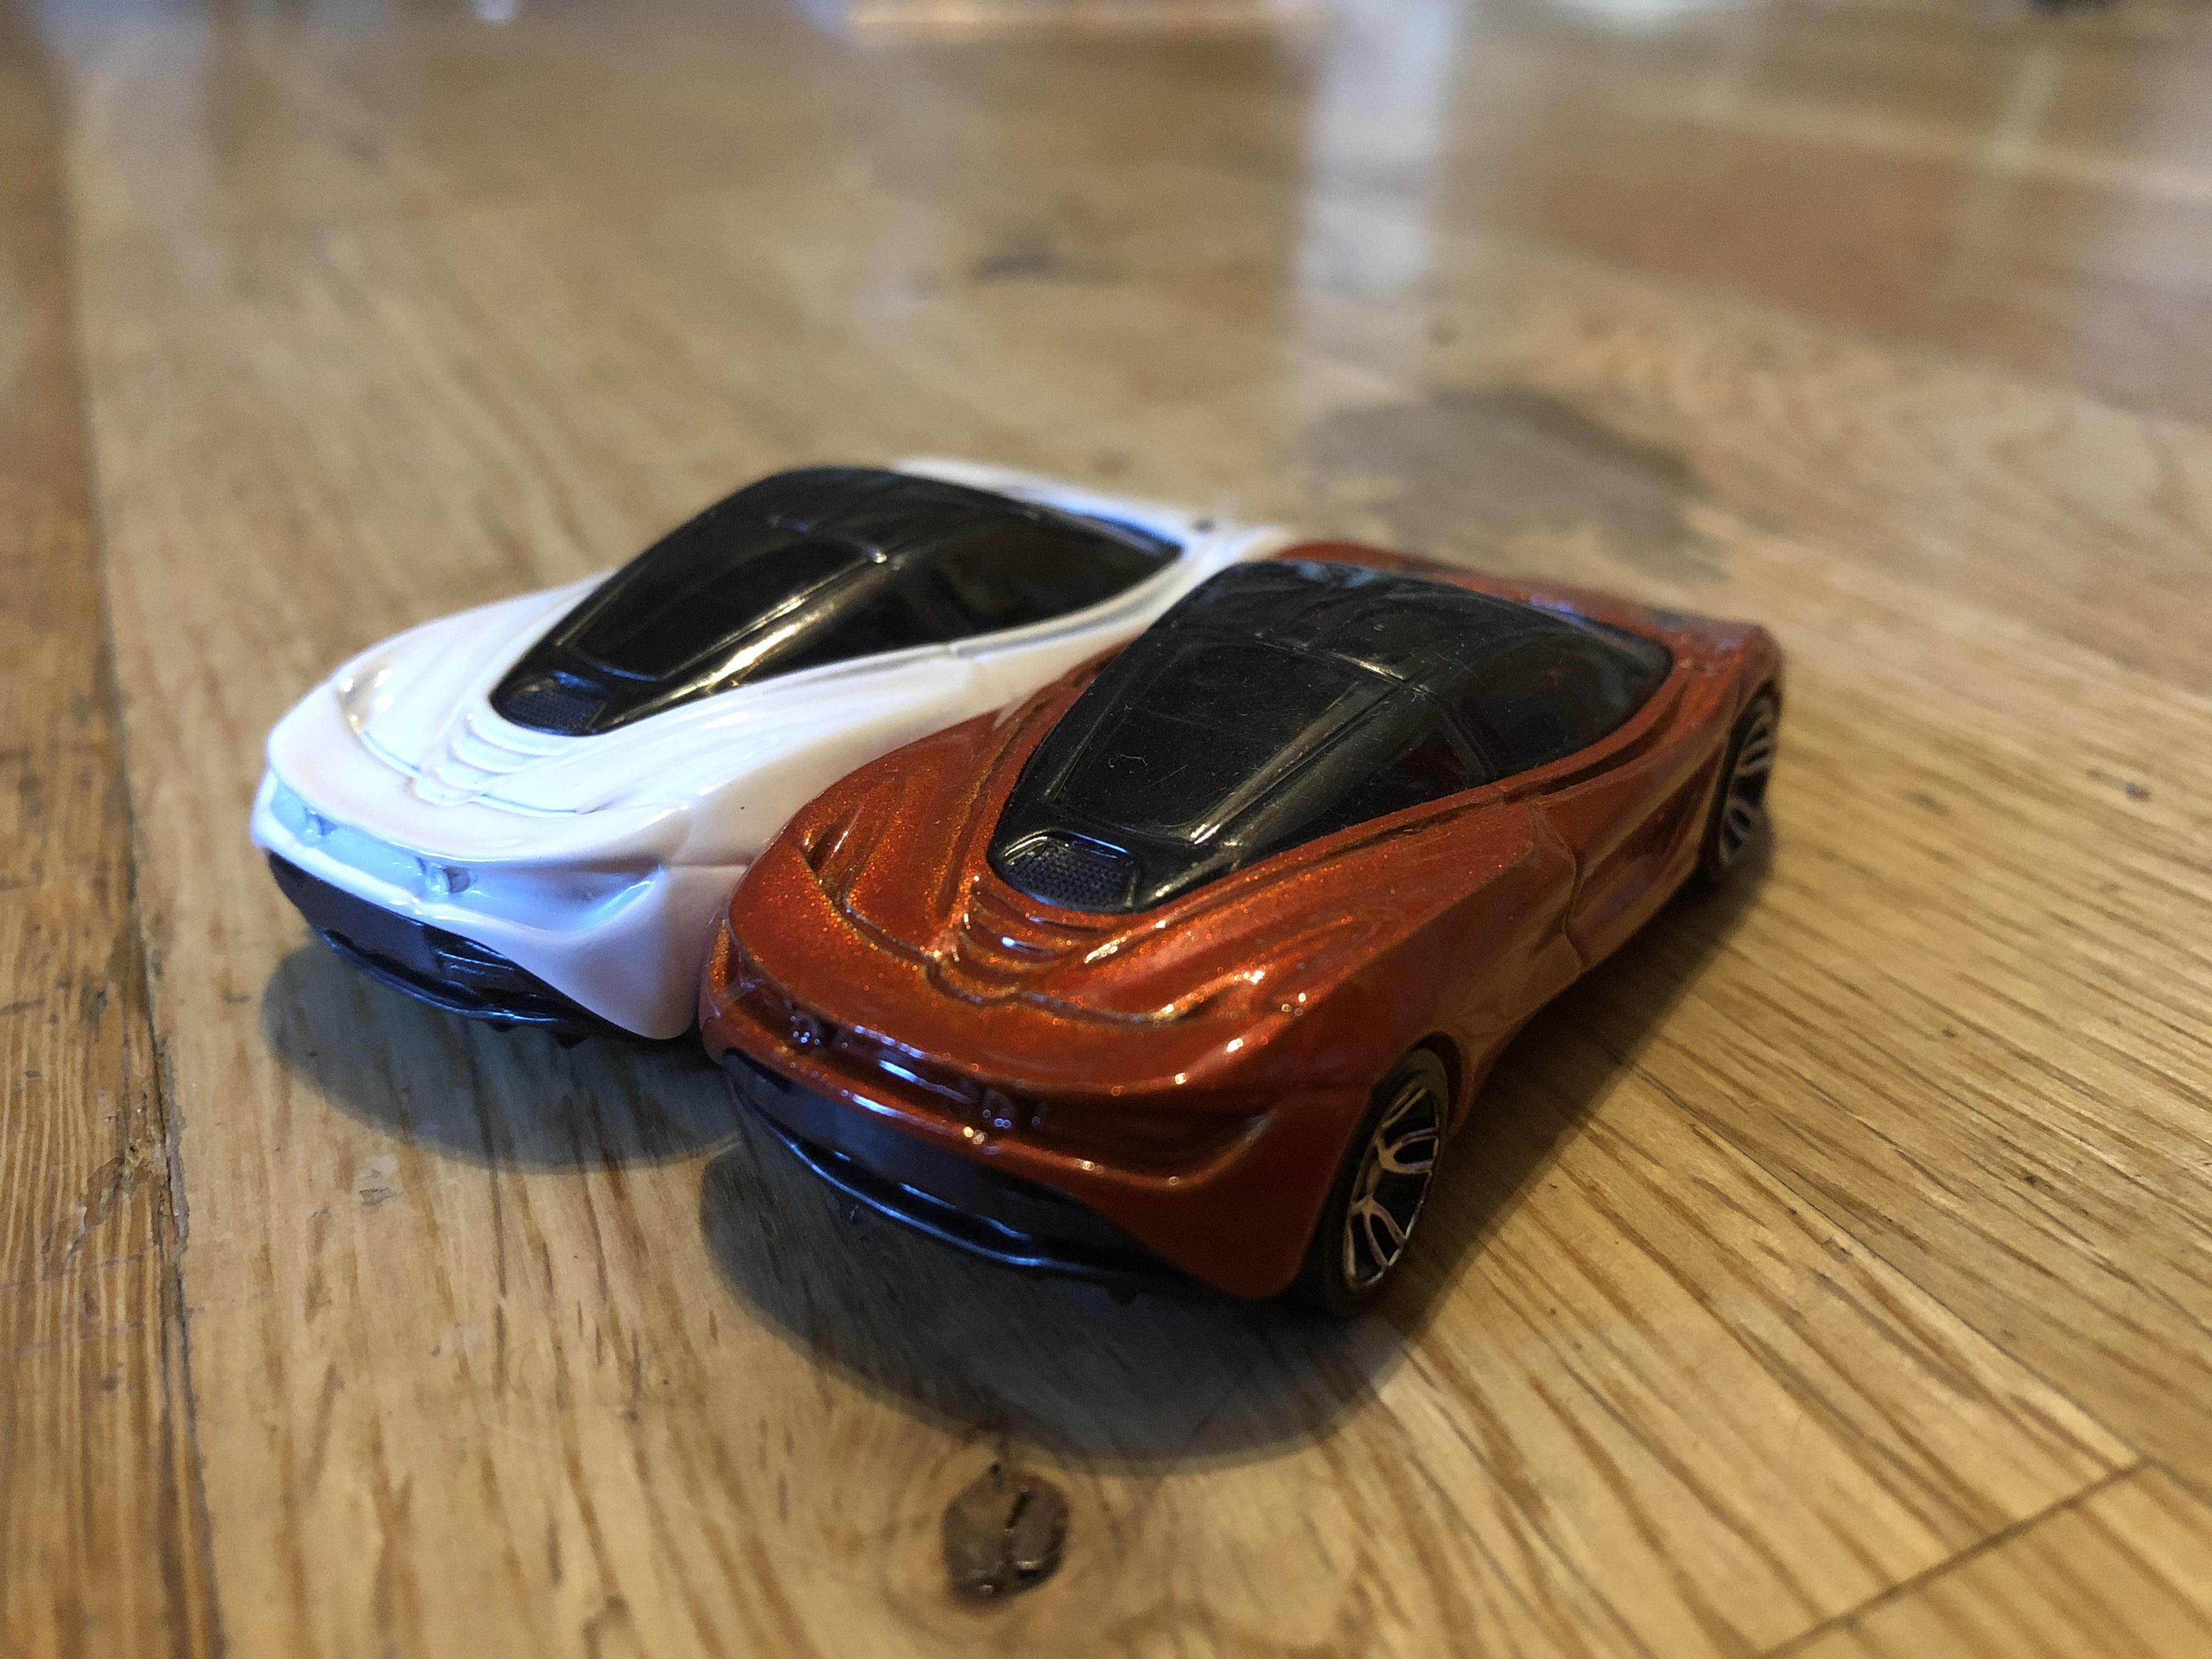 Hot Wheels Mclaren 720s Hotwheels 2 Comments